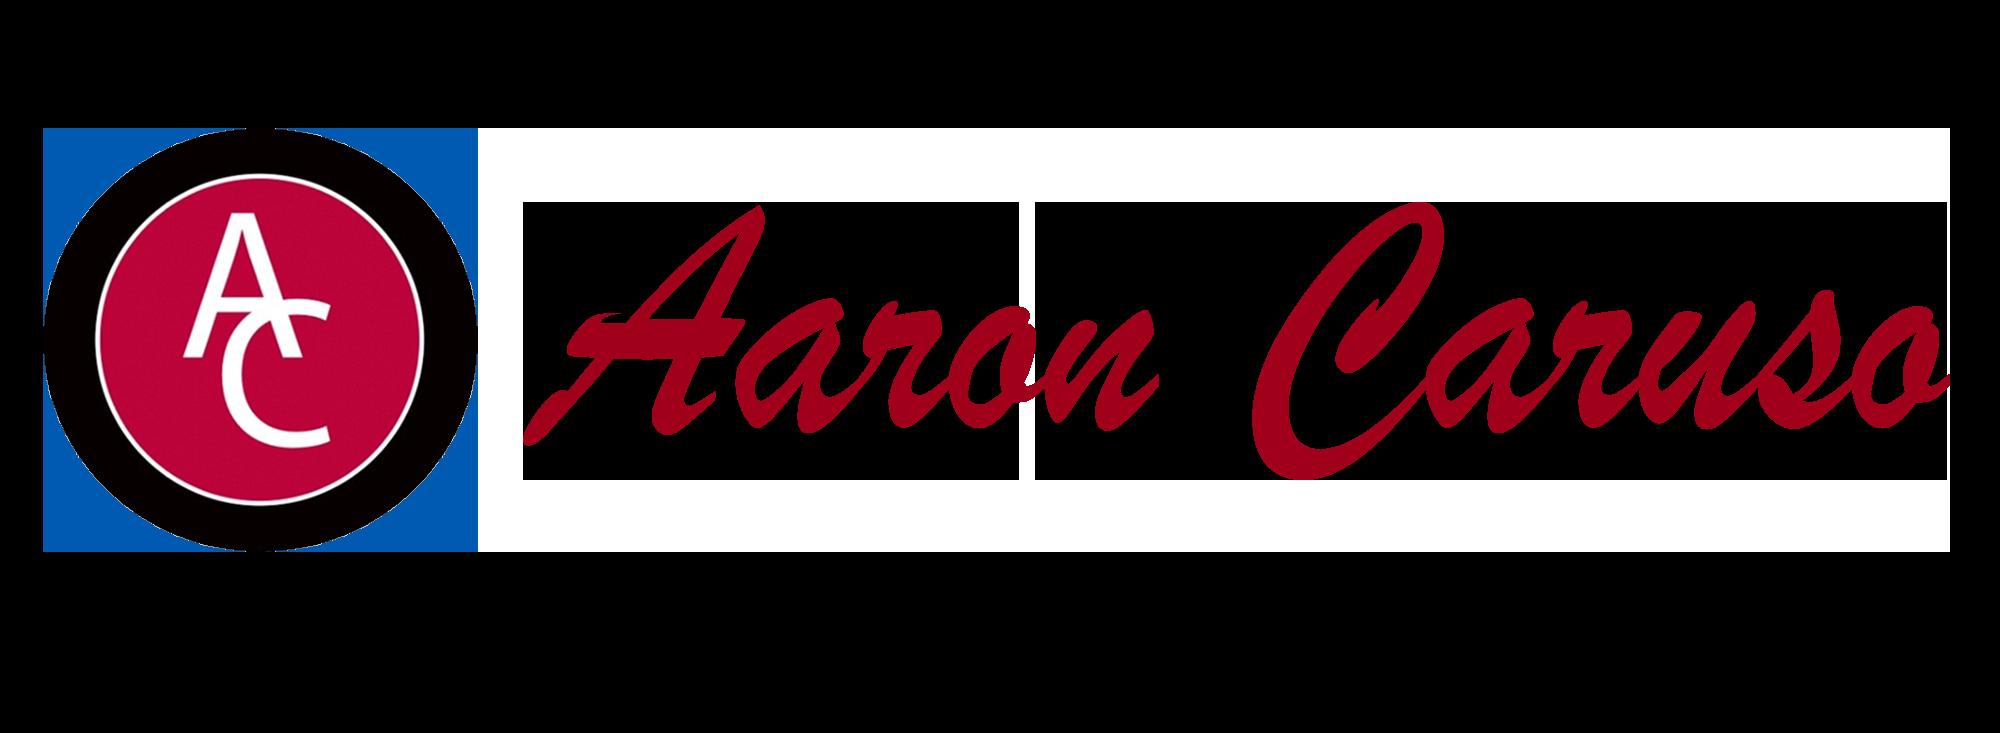 Aaron Caruso Official Website